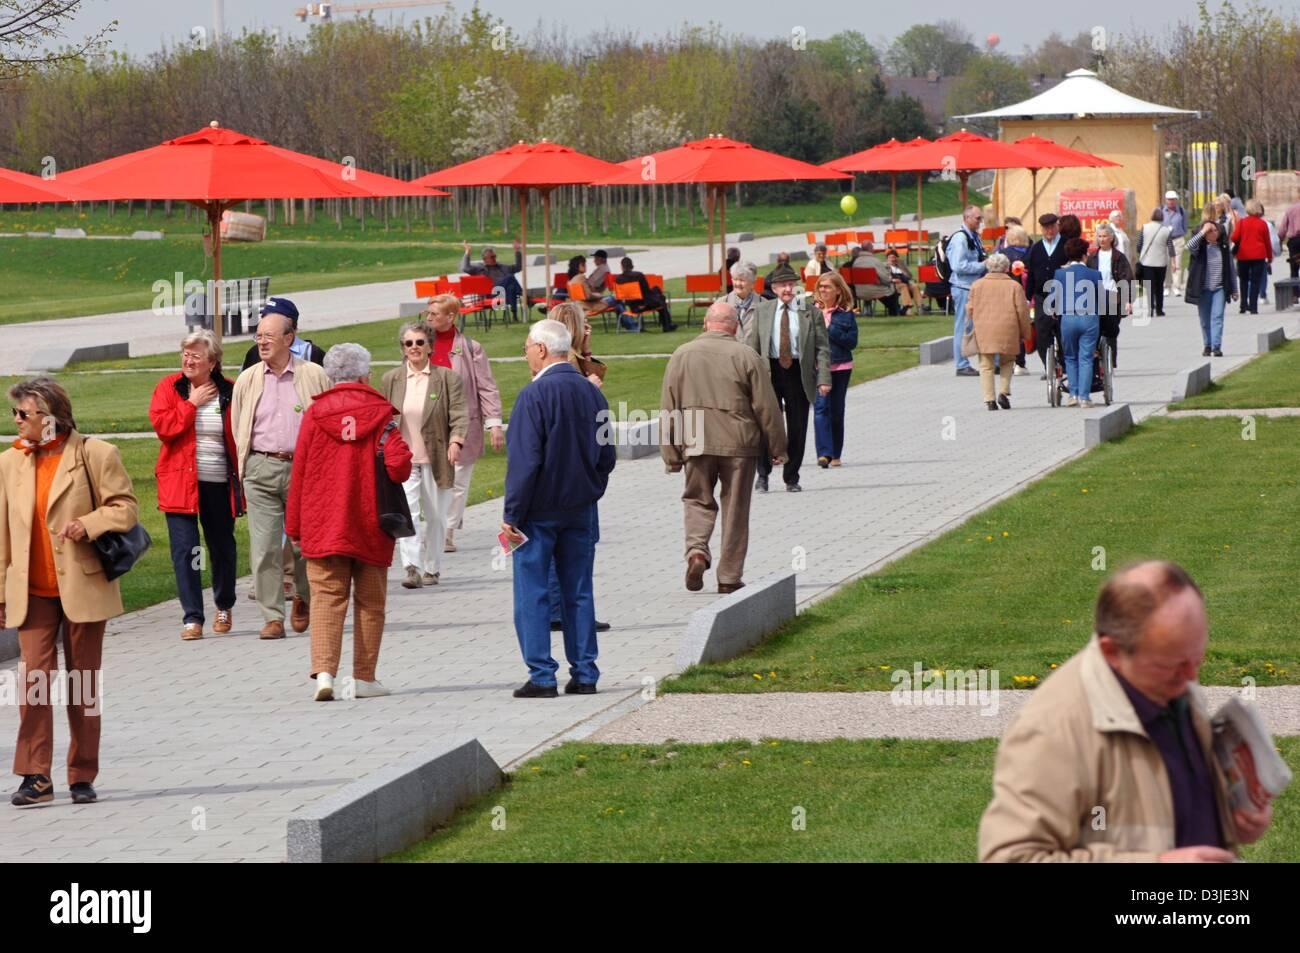 (dpa) - Visitors stroll through the premises of the Bundesgartenschau (BUGA 2005), garden show, in Munich, Germany, - Stock Image